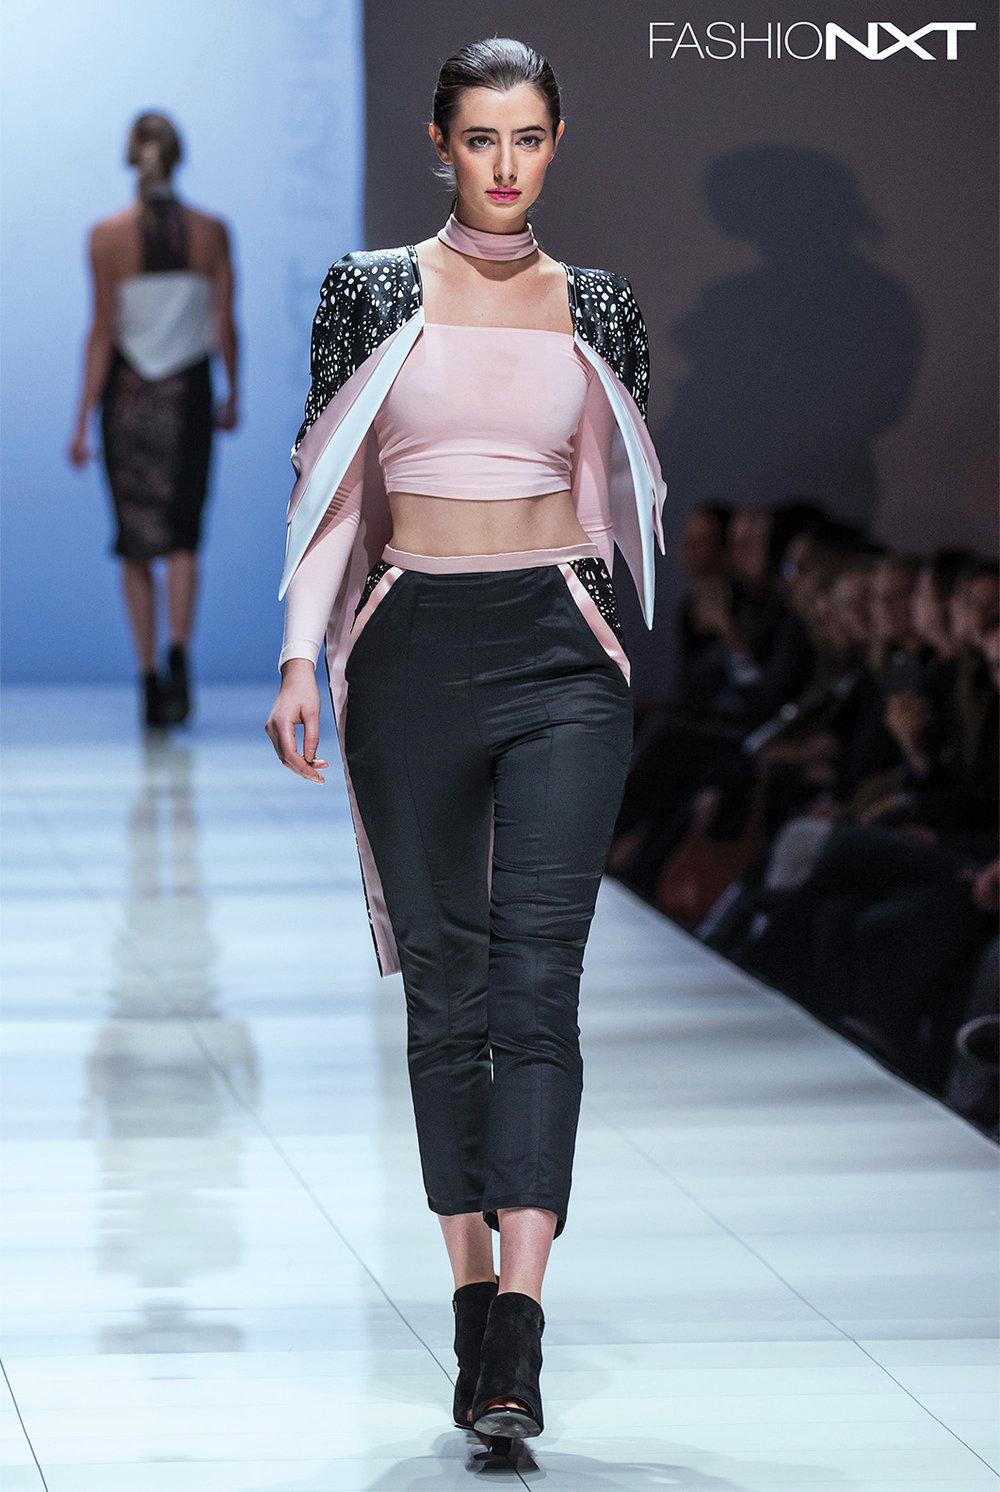 Model: Lucy Sondland